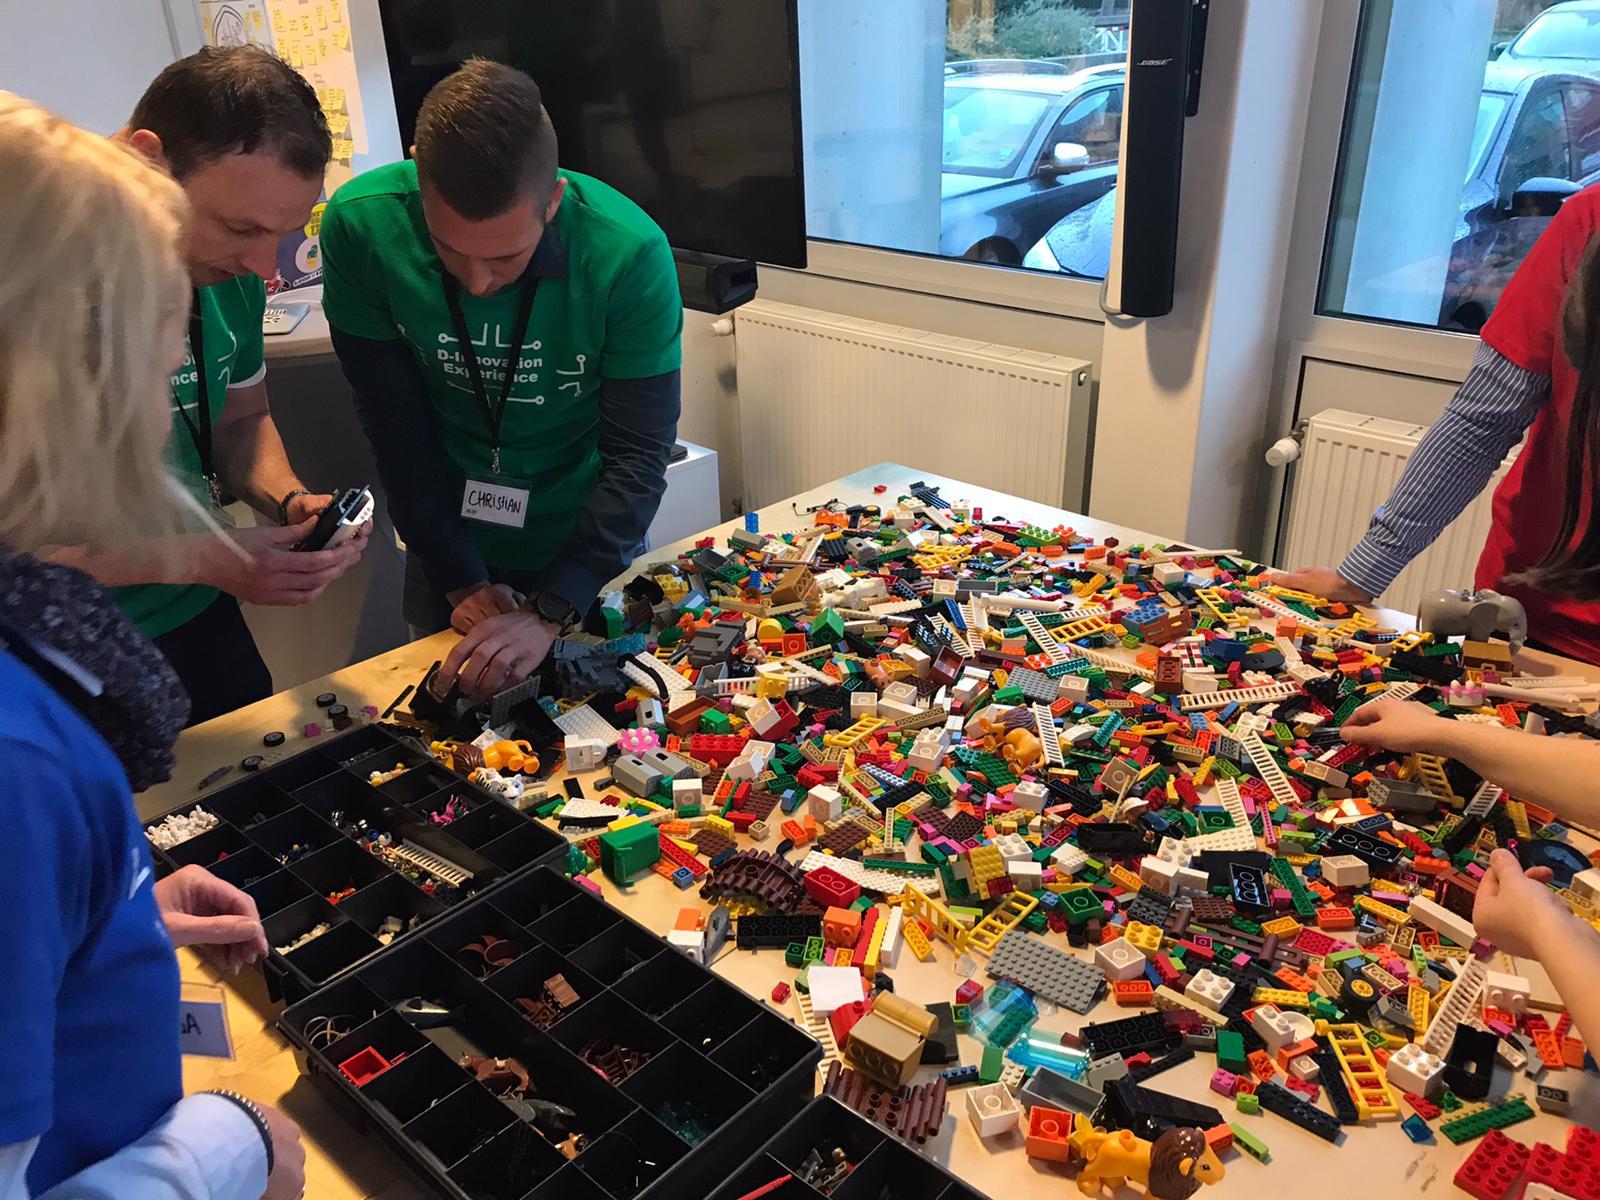 D-Innovation Experience Provincie Limburg 27 november 2019 - RichtingZuid